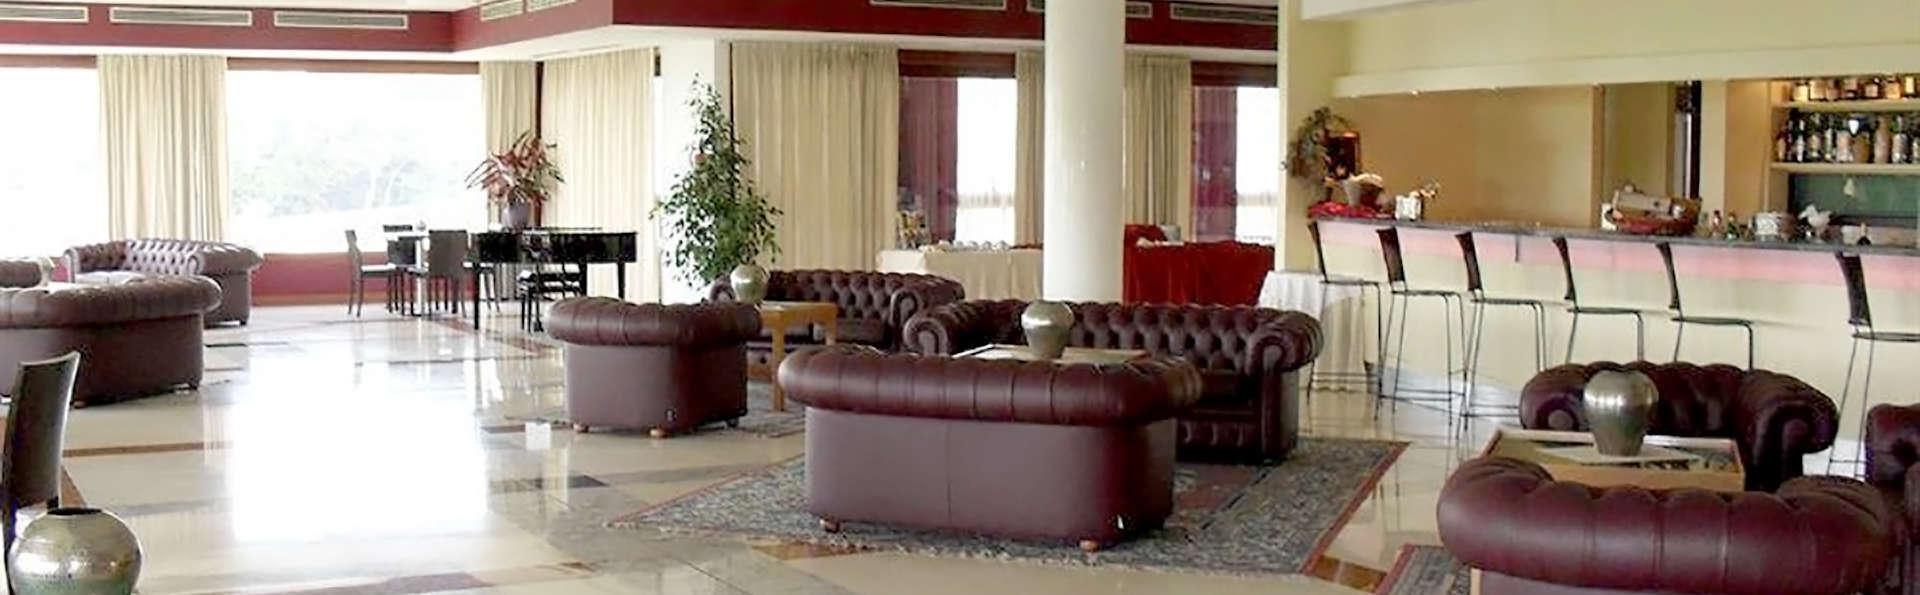 Eurocongressi Hotel - Edit_Hall.jpg